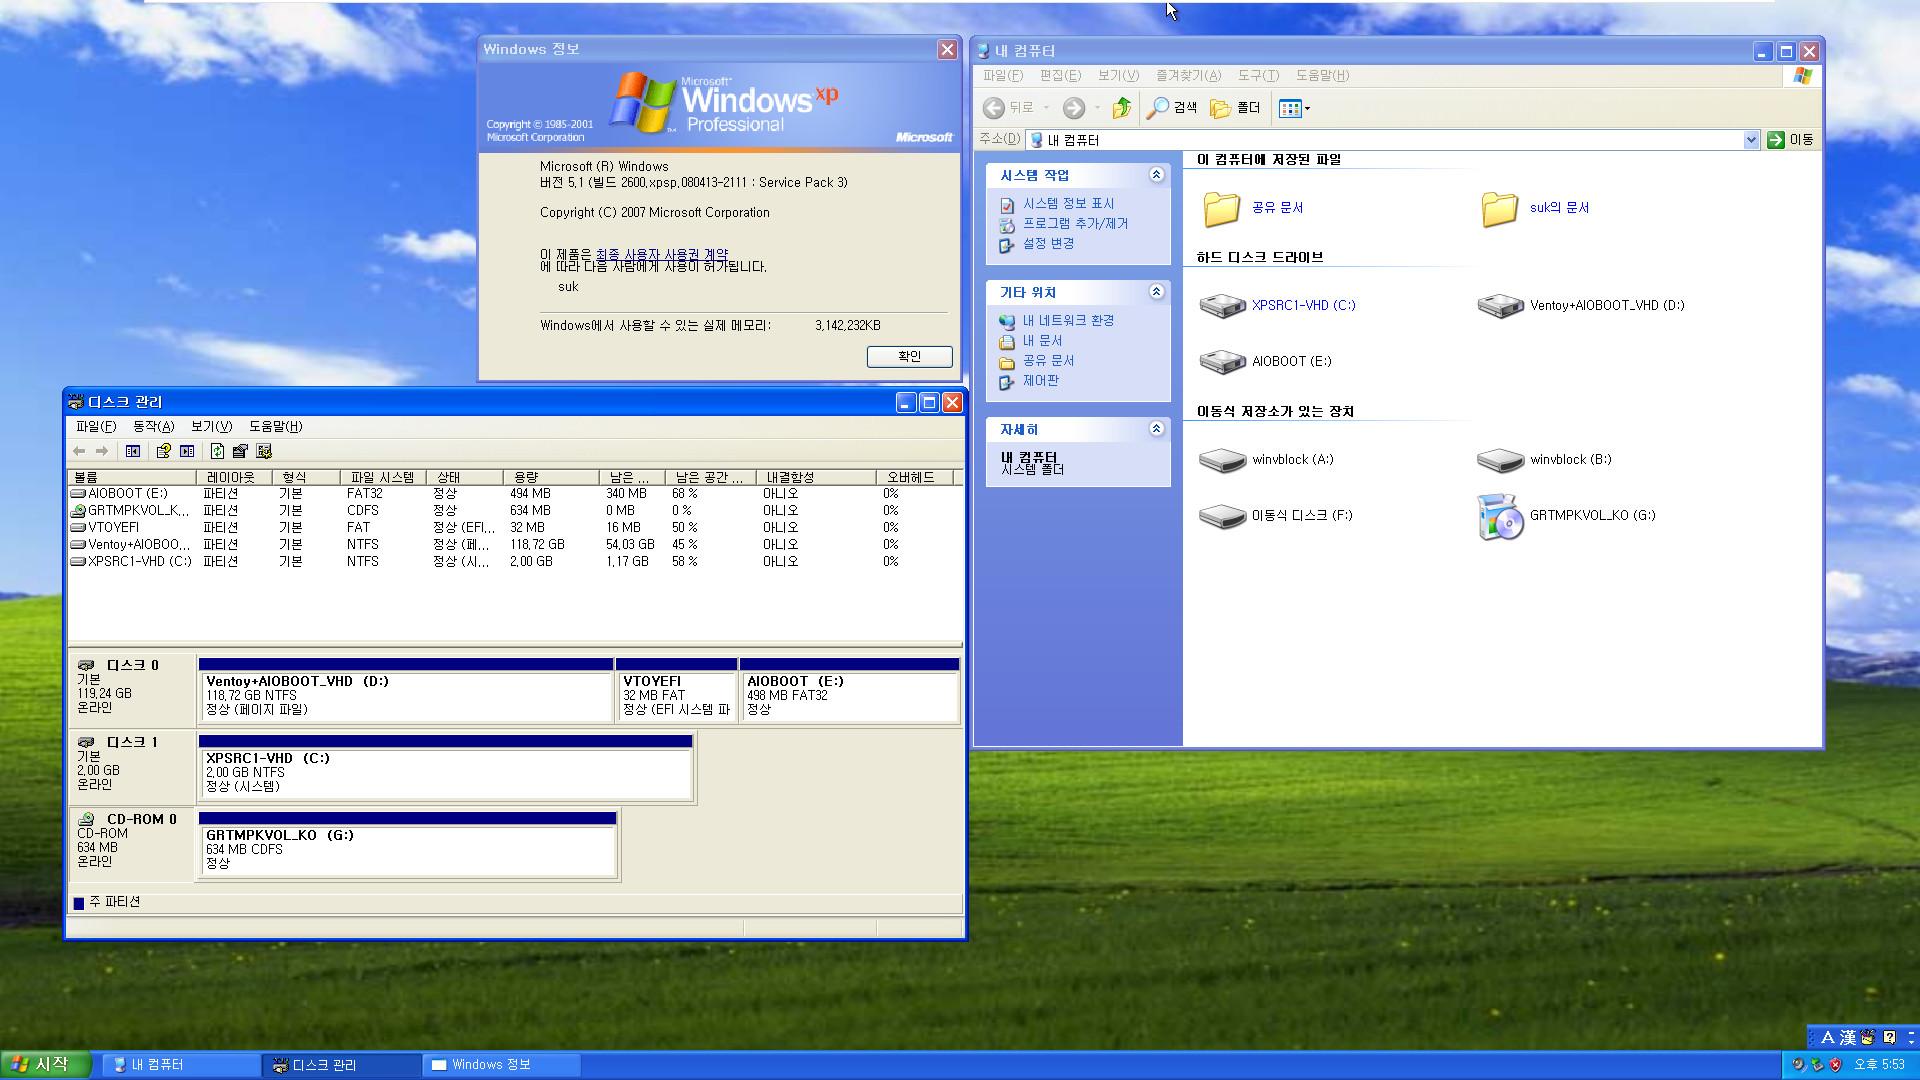 AIO Boot가 v0.9.9.14 부터 XP.vhd 부팅 지원해서 테스트 - vmware를 XP로 설정하여 xp.vhd 설치부터 grub4dos로 해야 하네요 2020-09-23_175339.jpg